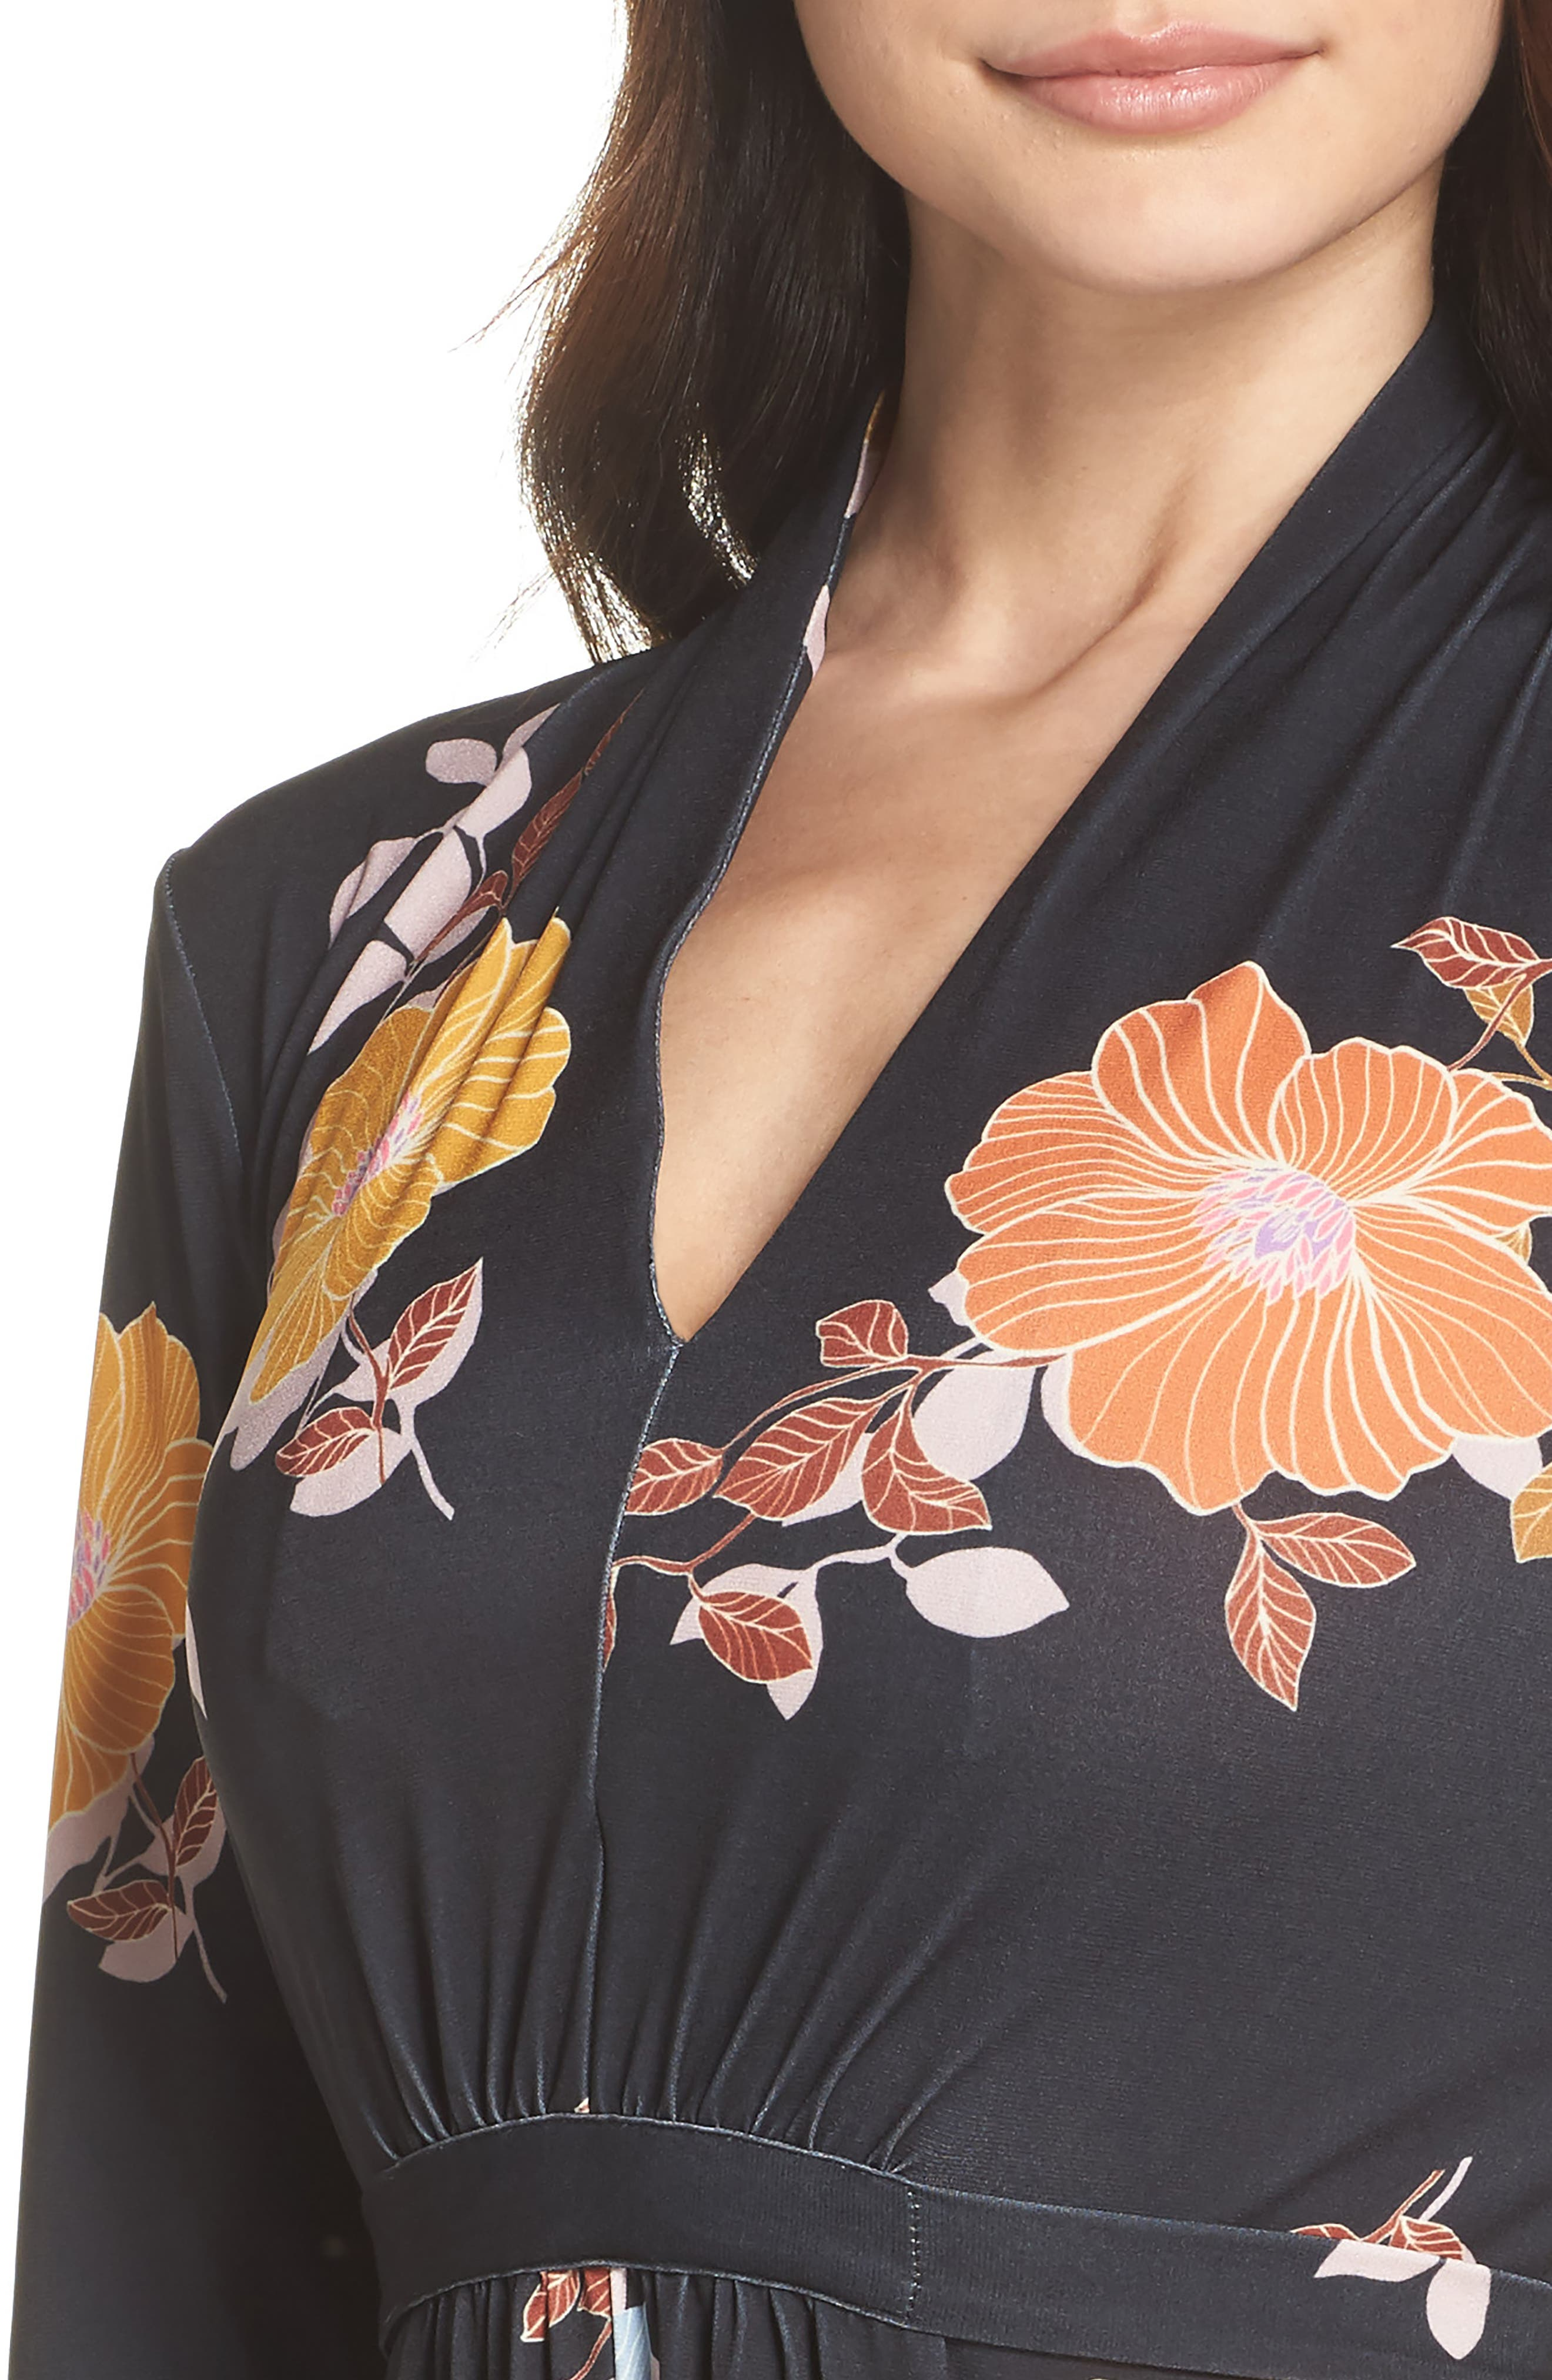 Shikoku Floral Dress,                             Alternate thumbnail 4, color,                             015